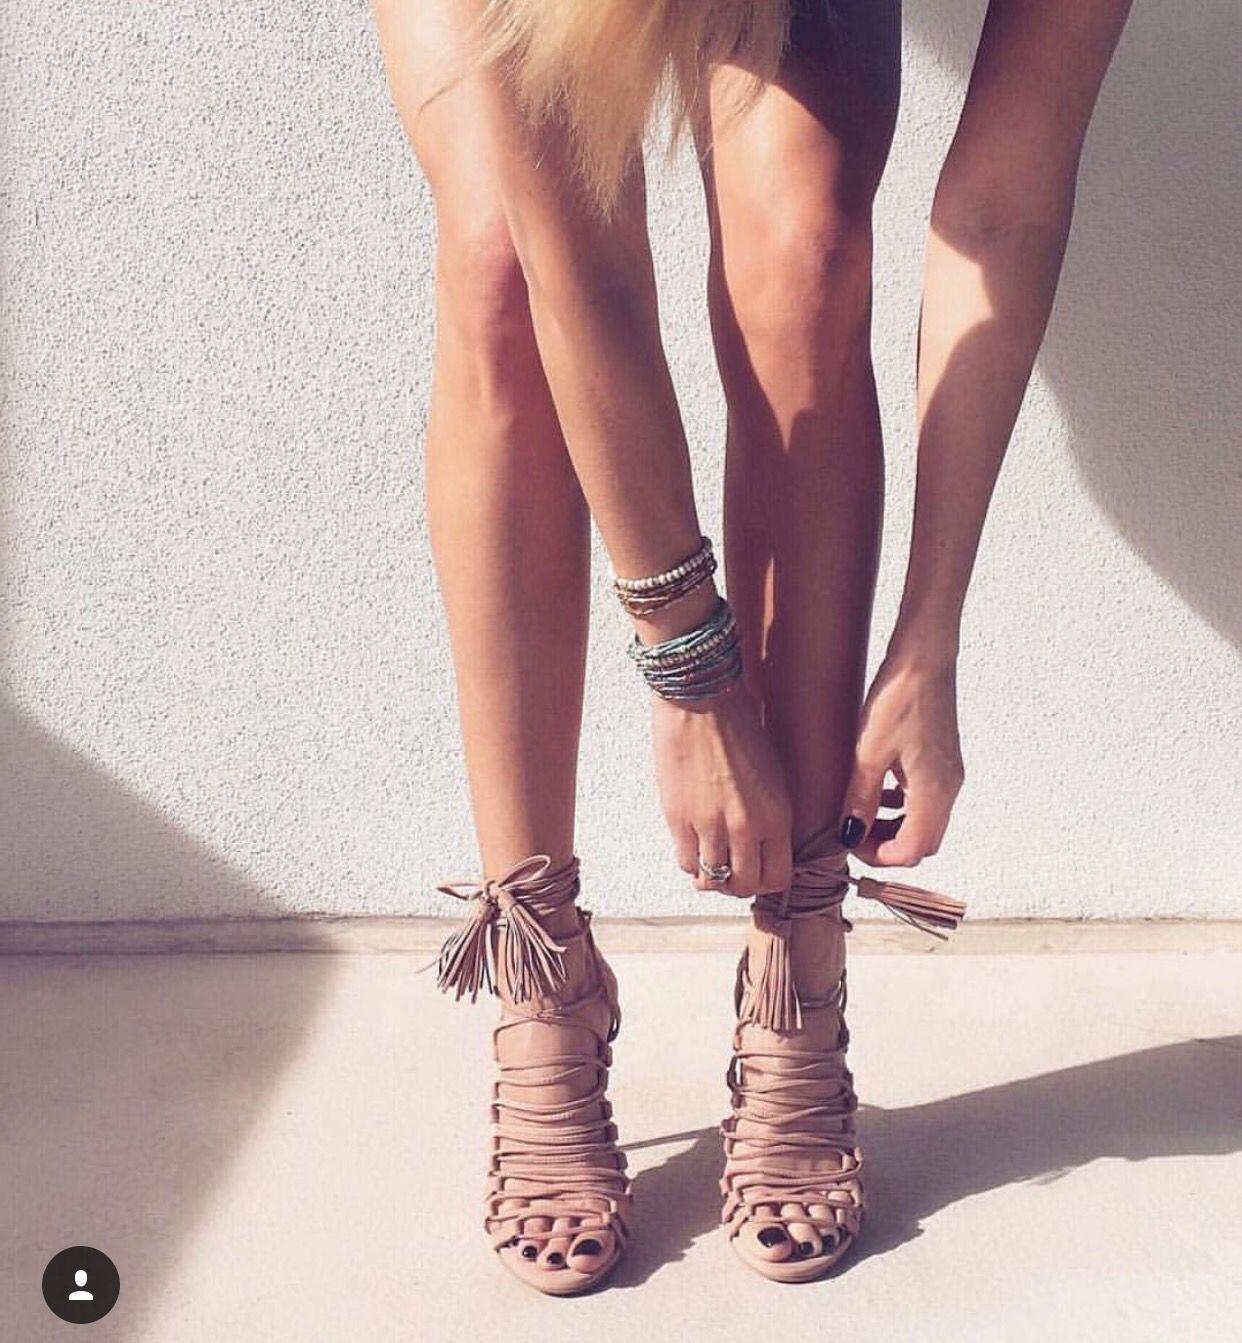 Legs......